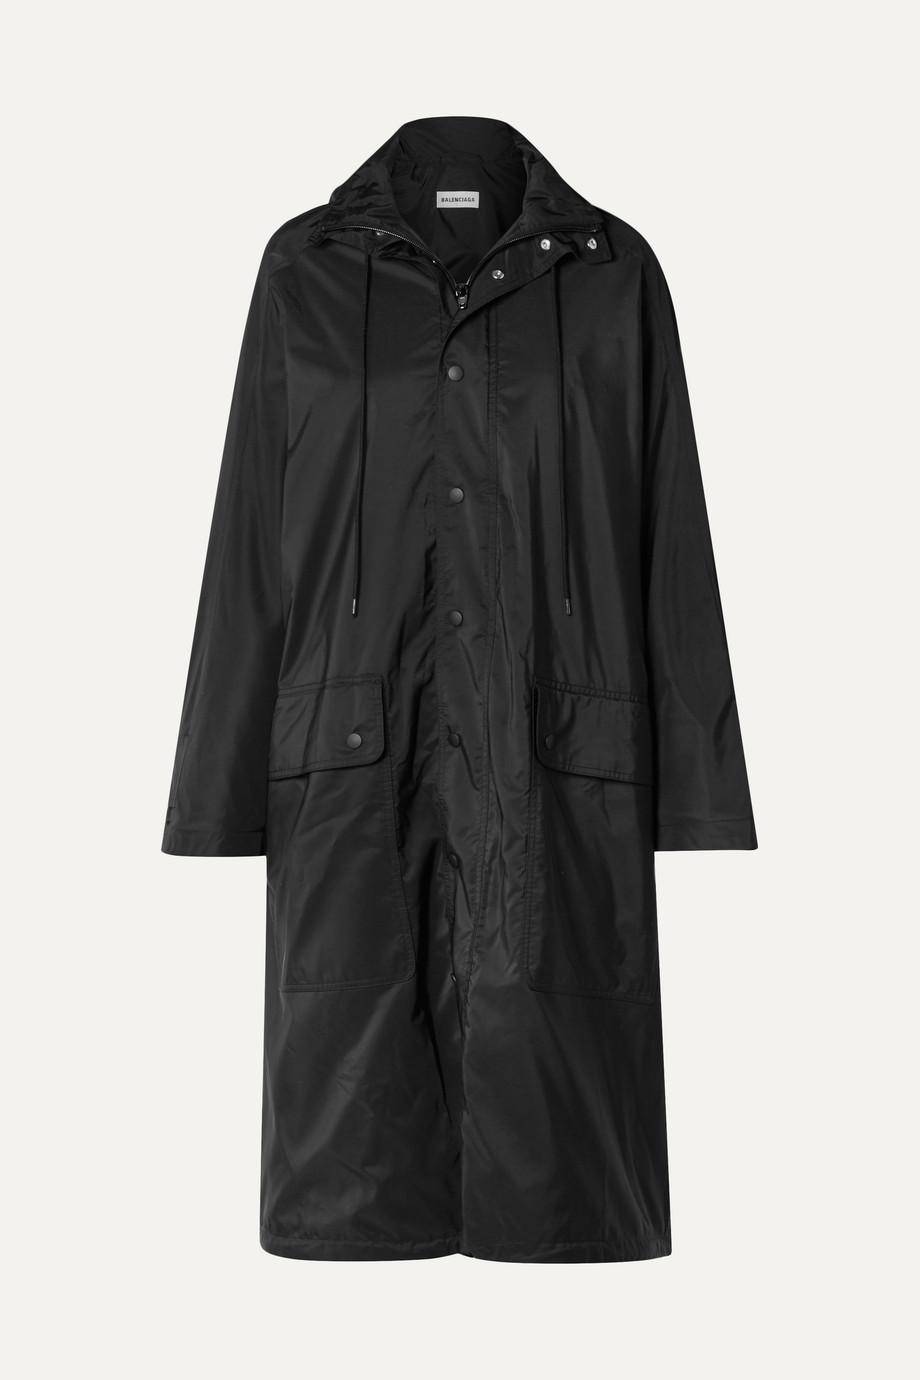 Balenciaga Opera oversized printed reflective shell raincoat